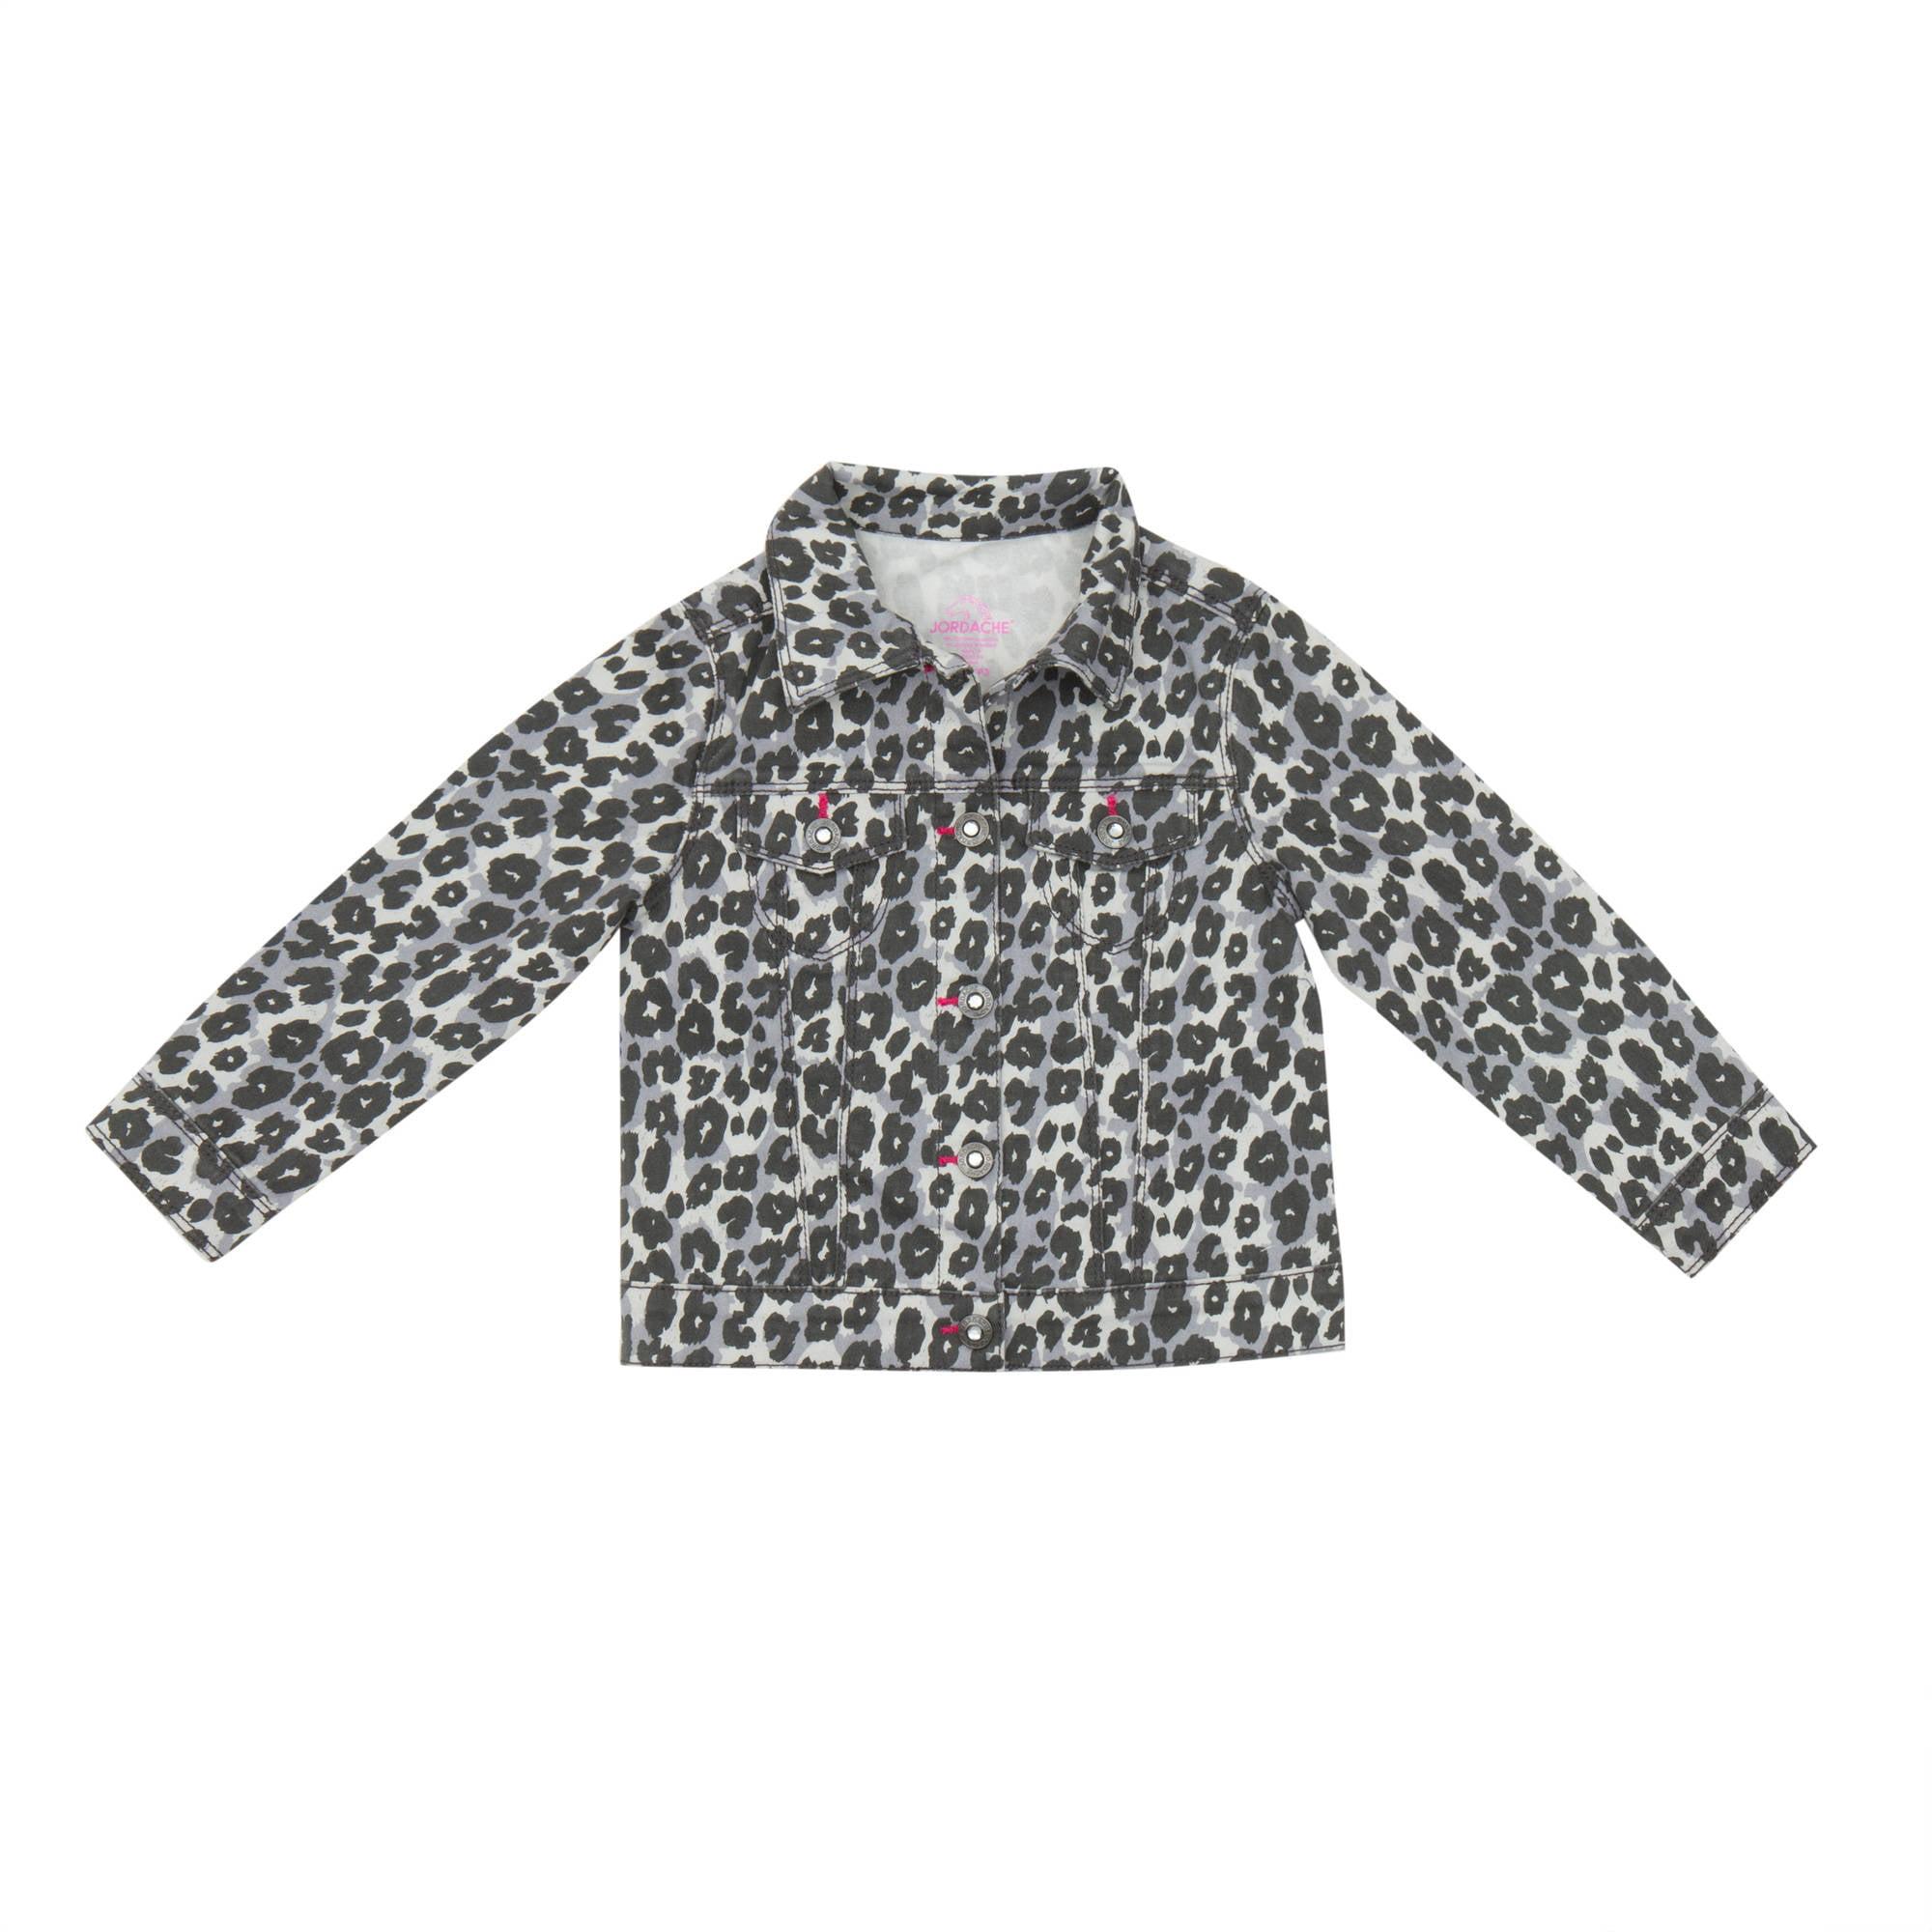 Jordache Baby Toddler Girl Denim Jacket